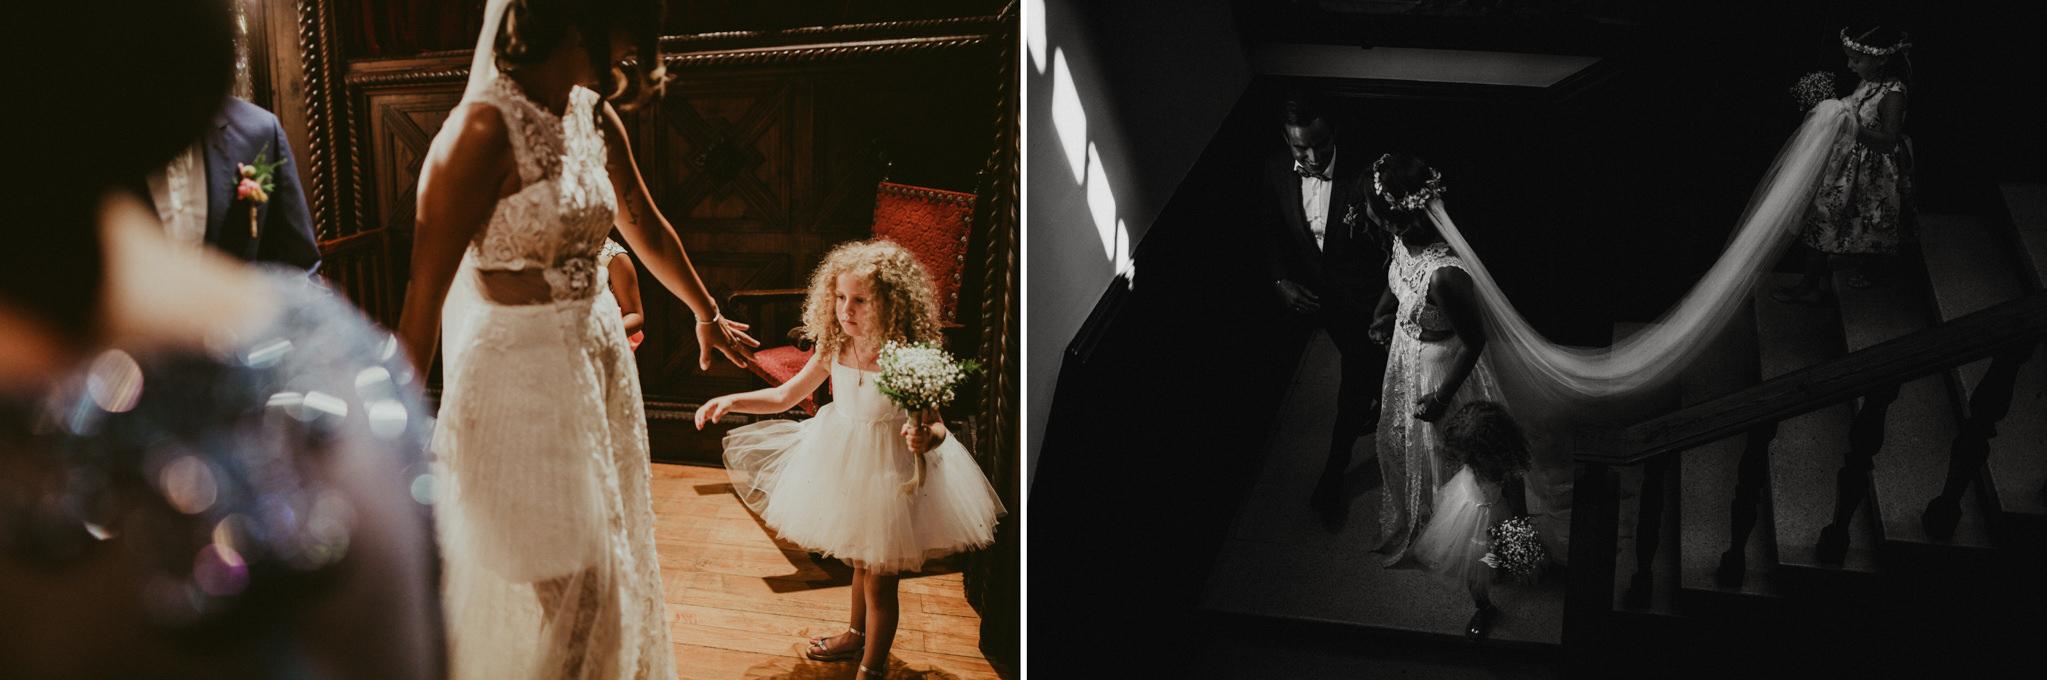 don+helen-wedding-photographer-oregon-portland-236